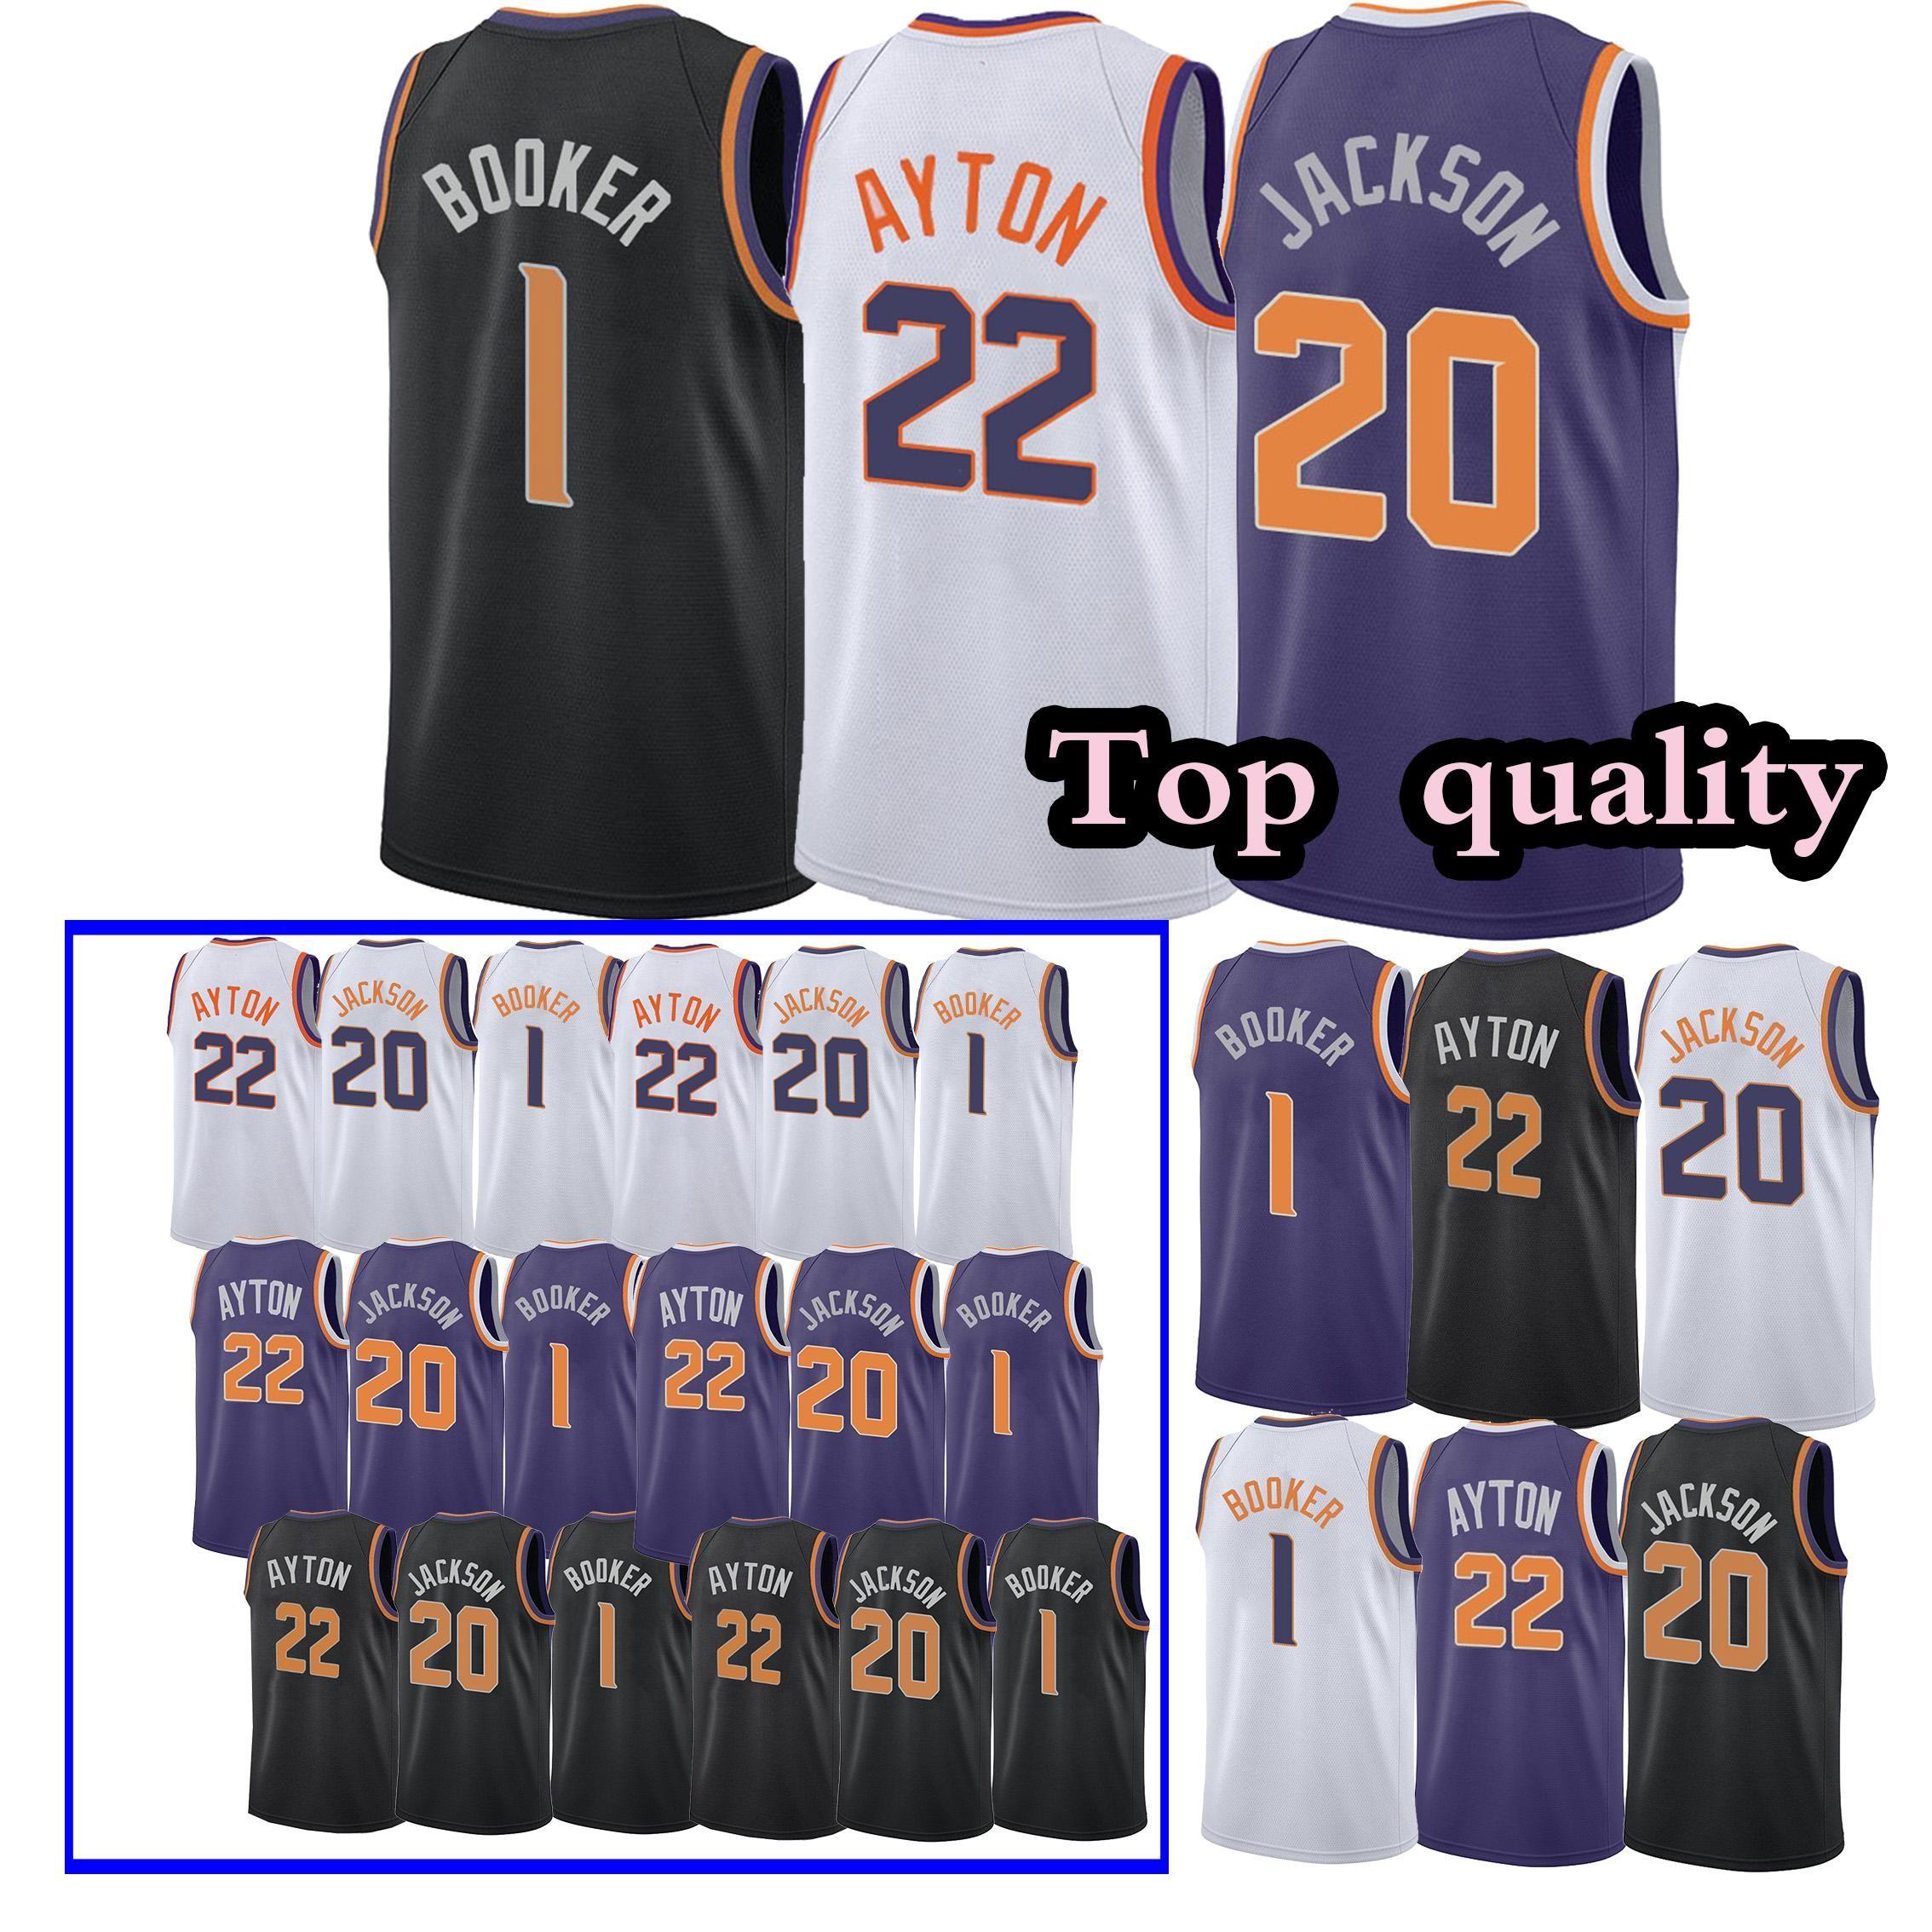 best service 526af 3309e Phoenix Jerseys Suns Devin 1 Booker Josh 20Jackson DeAndre 22 Ayton youth  Adult Embroidery Logos